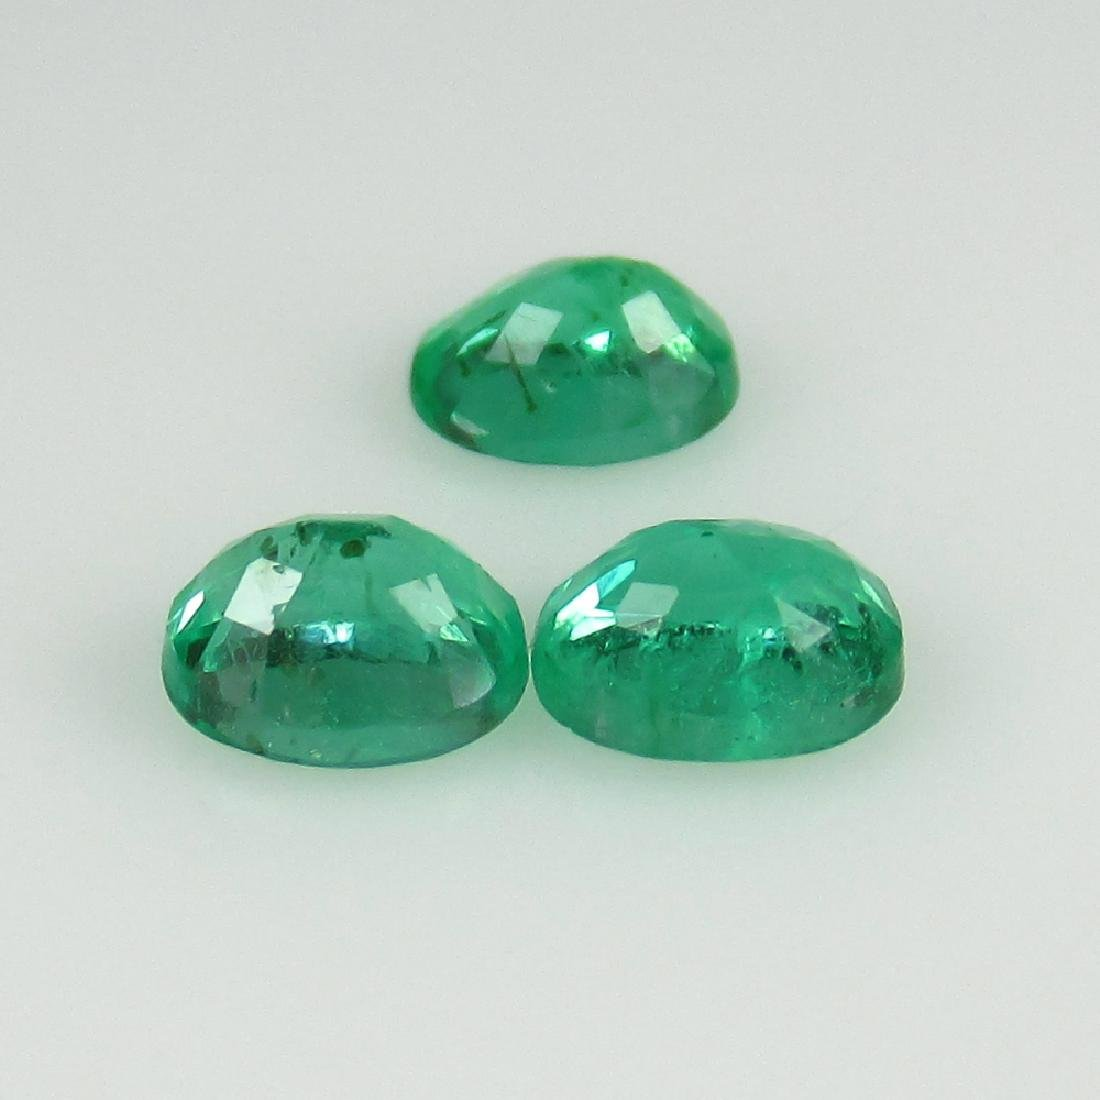 0.72 Ctw Natural 3 Loose Zambian Emerald 4.5X3.5 mm - 2